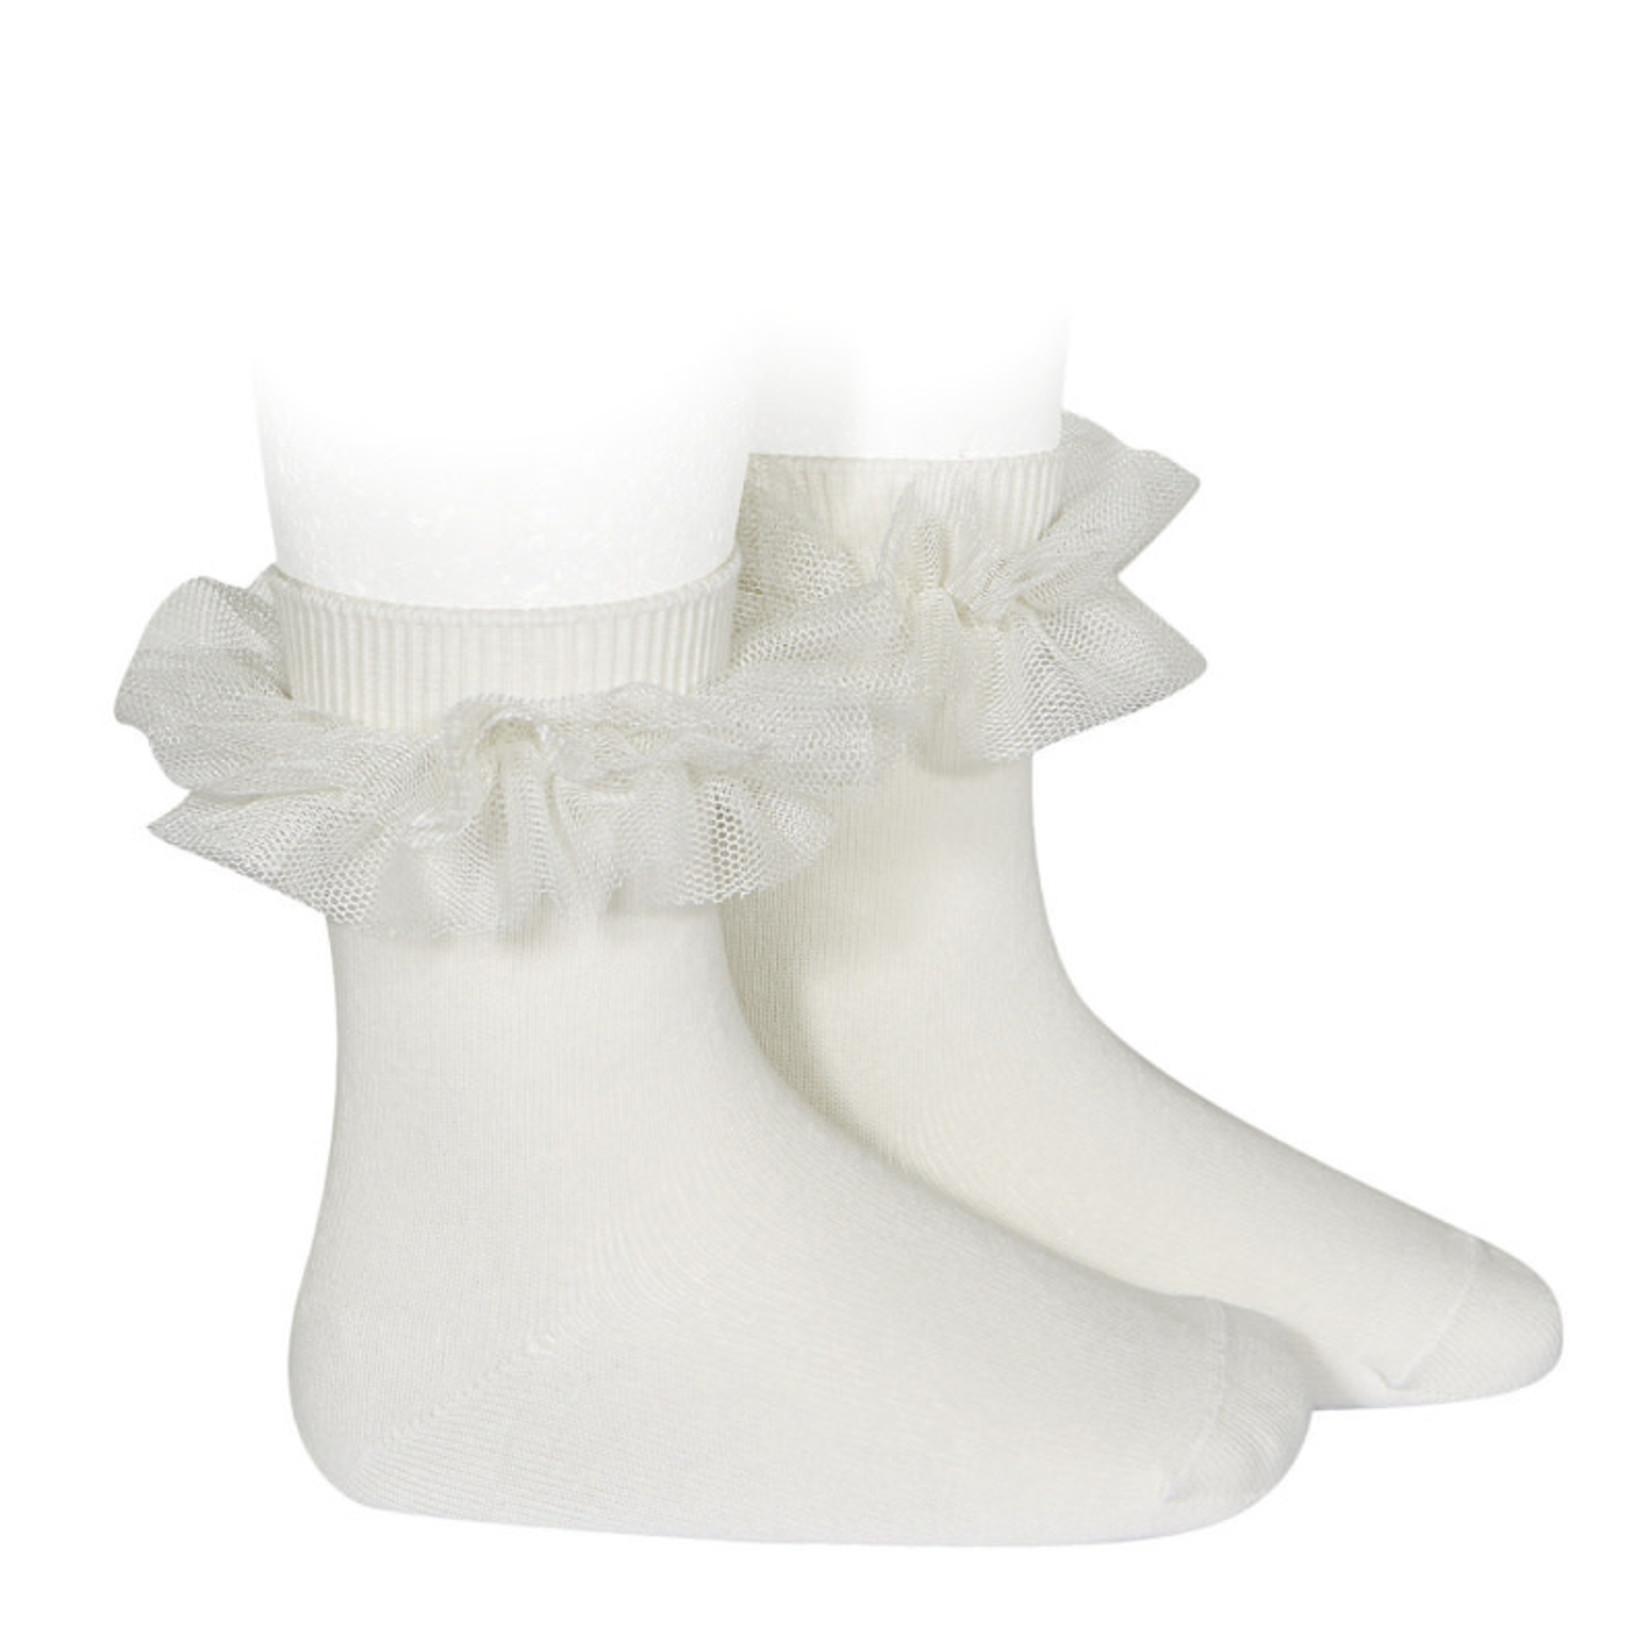 Condor Socks Ruffle - Creme